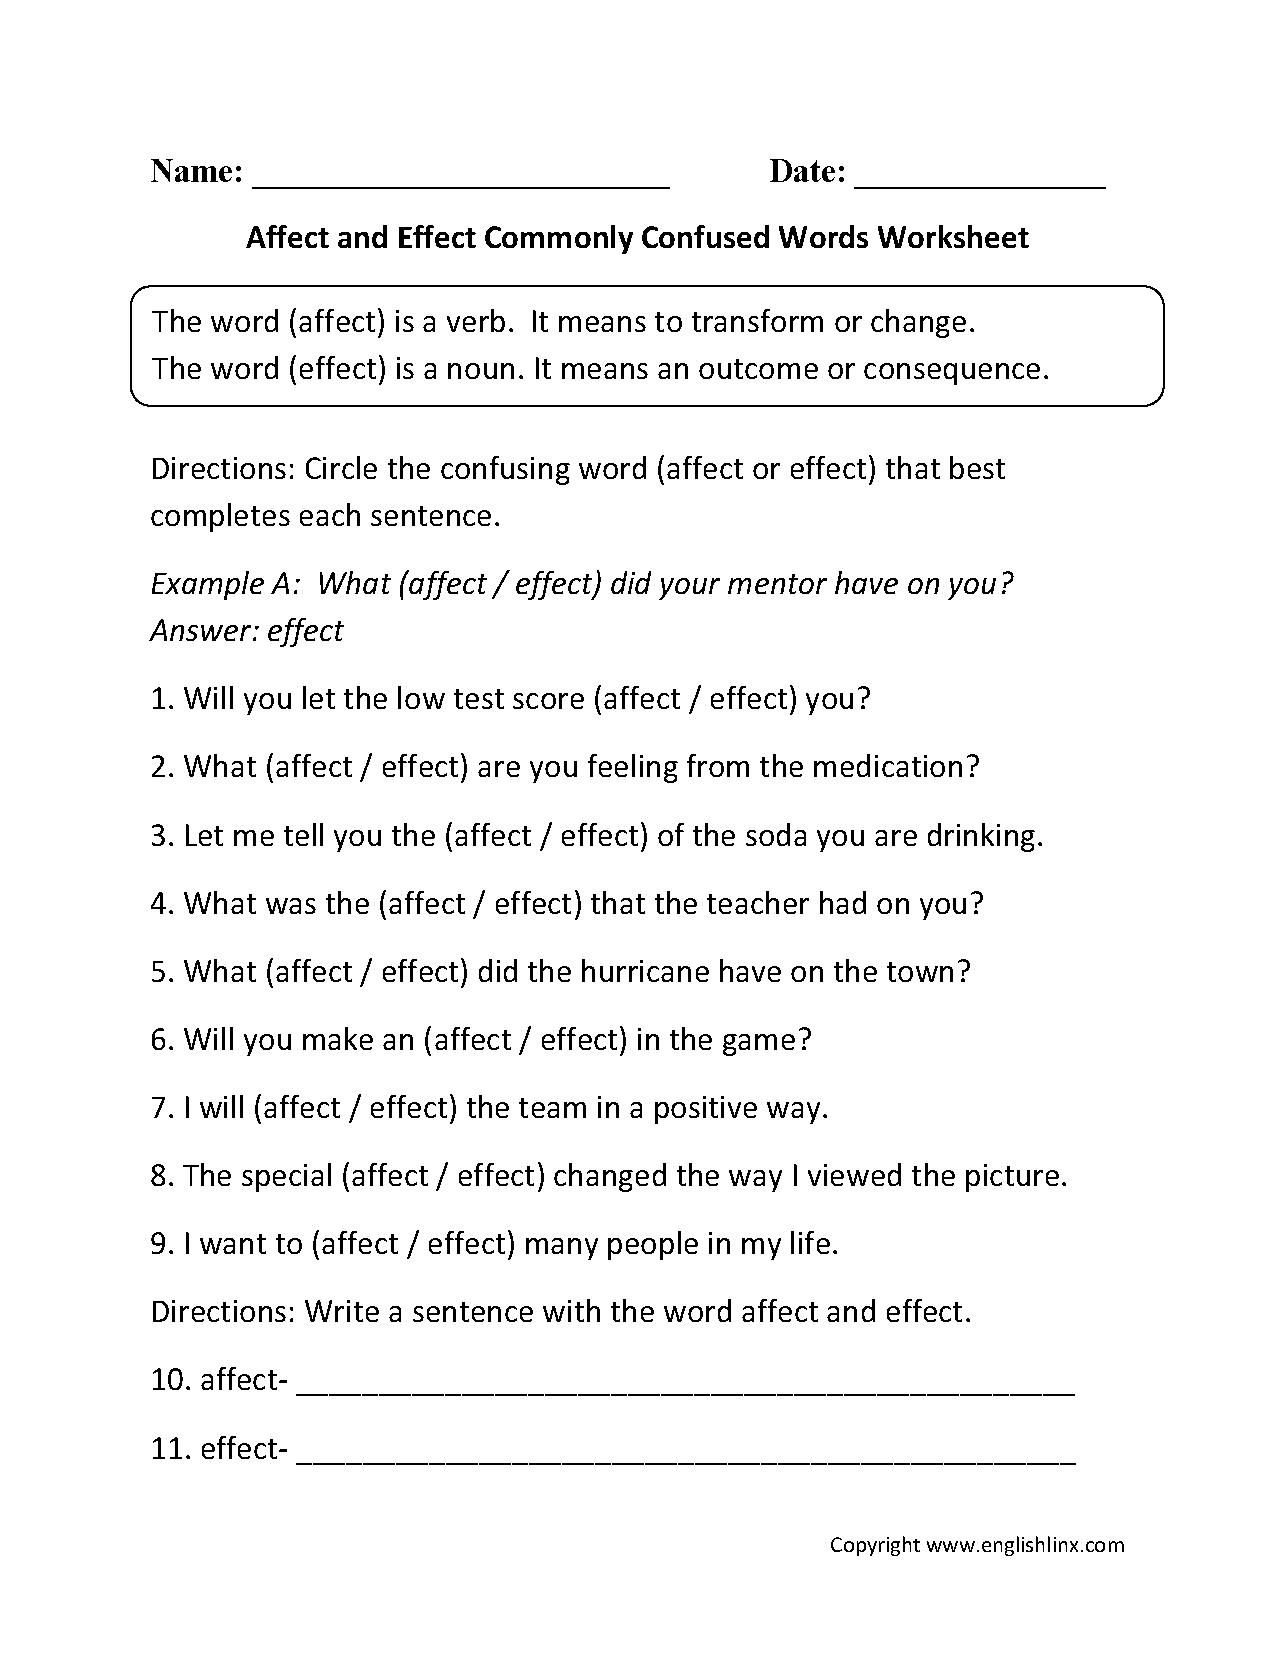 worksheet Affect Effect Worksheet affect and effect commonly confused words worksheets bonitareimer worksheets